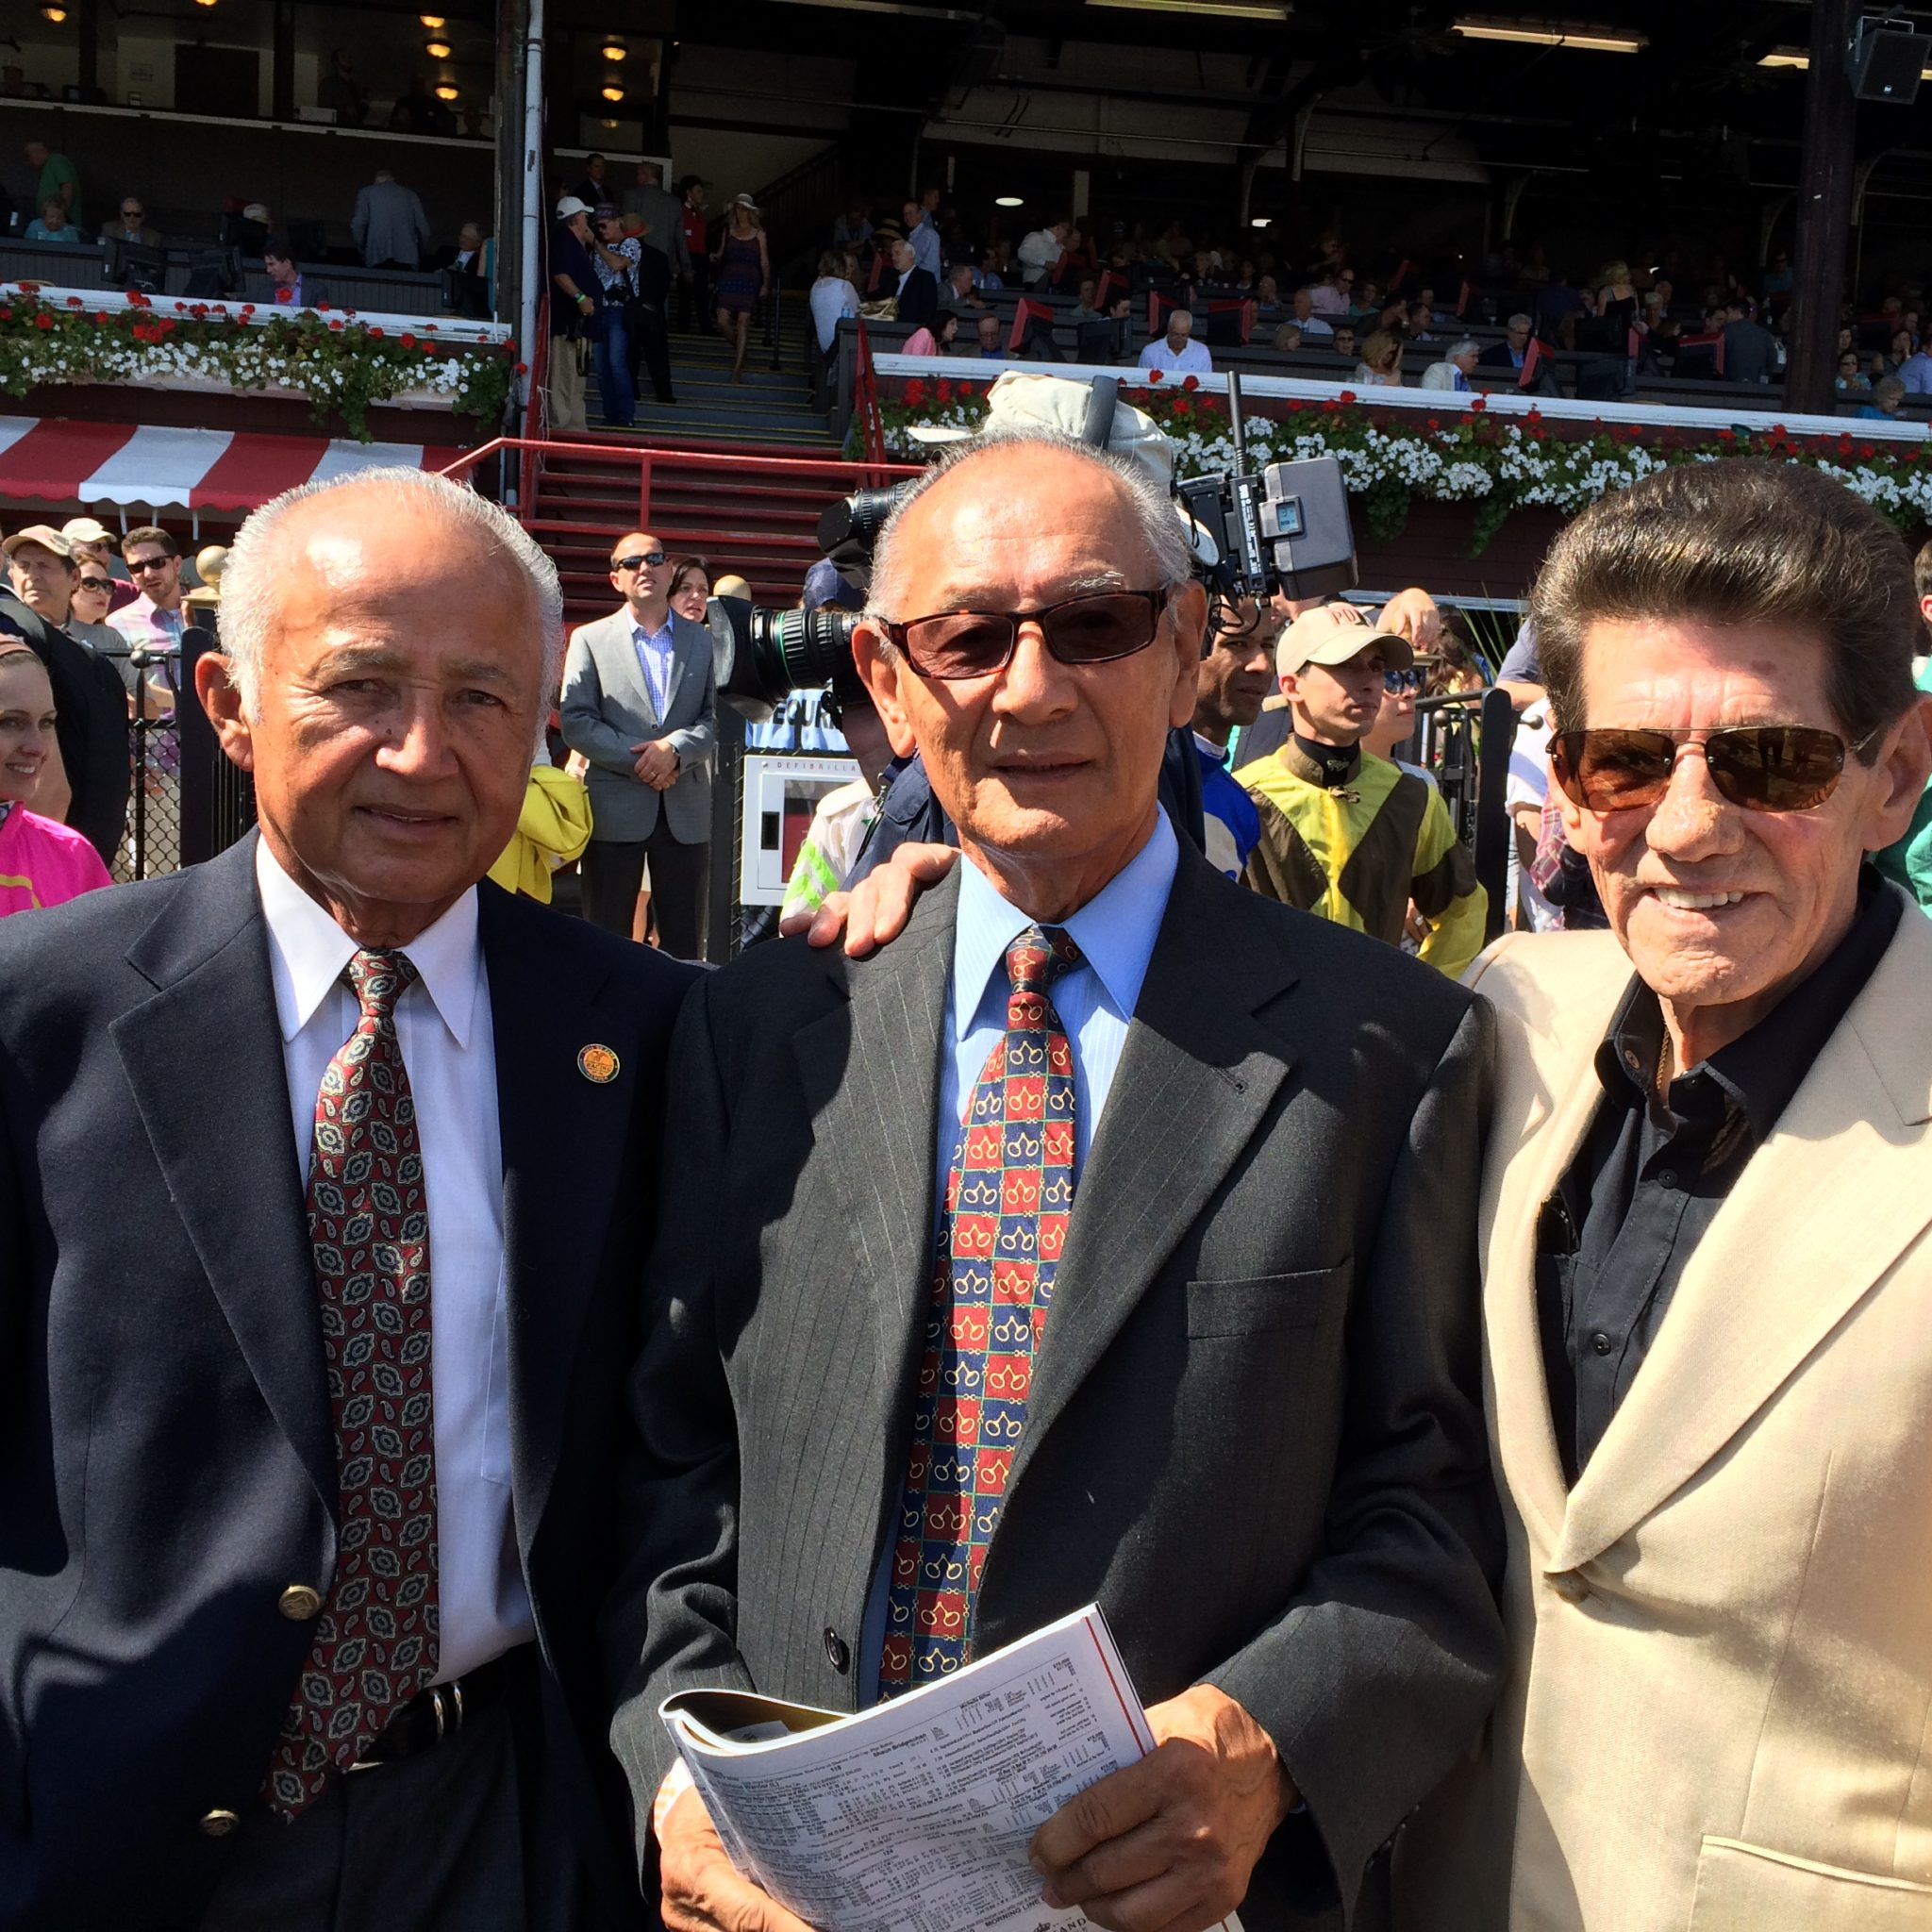 Vasquez, Baeza, Ycaza at Saratoga